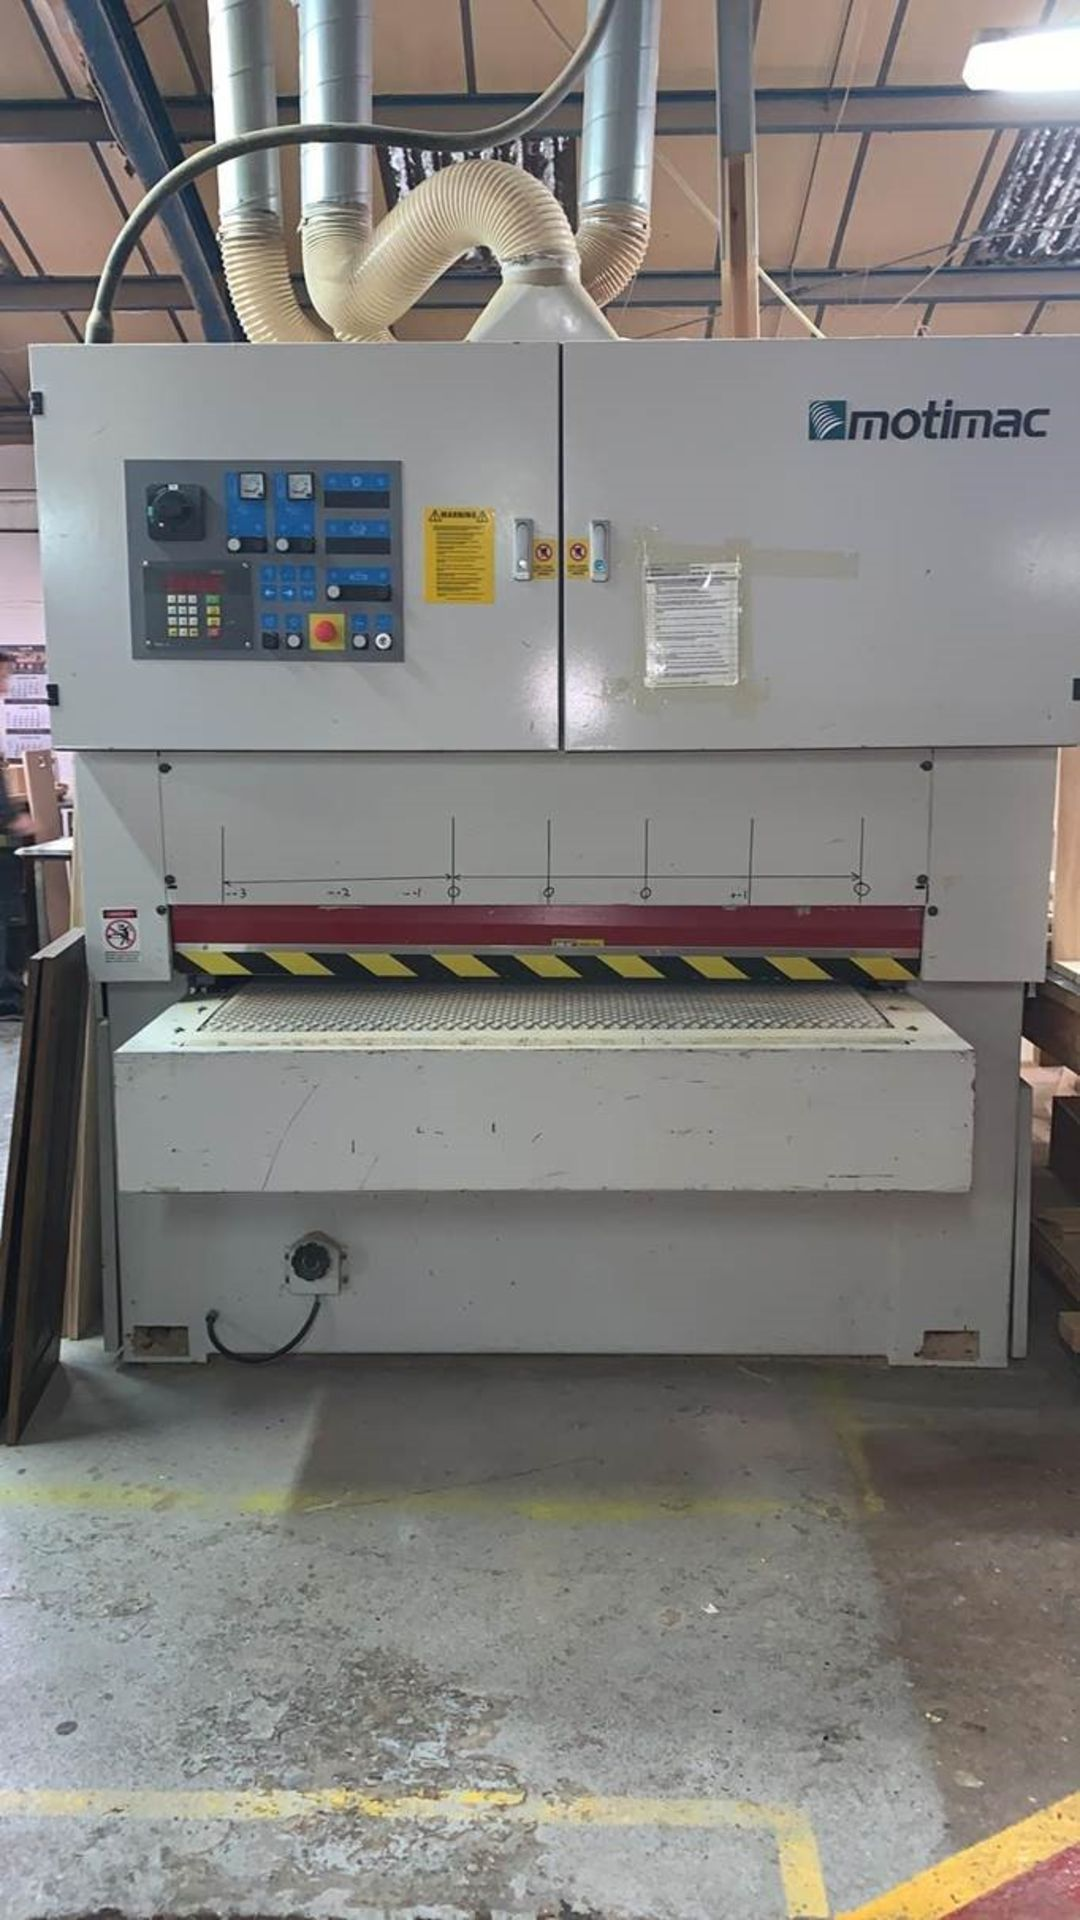 Motimac 1300mm Wide Belt Woodworking Sander